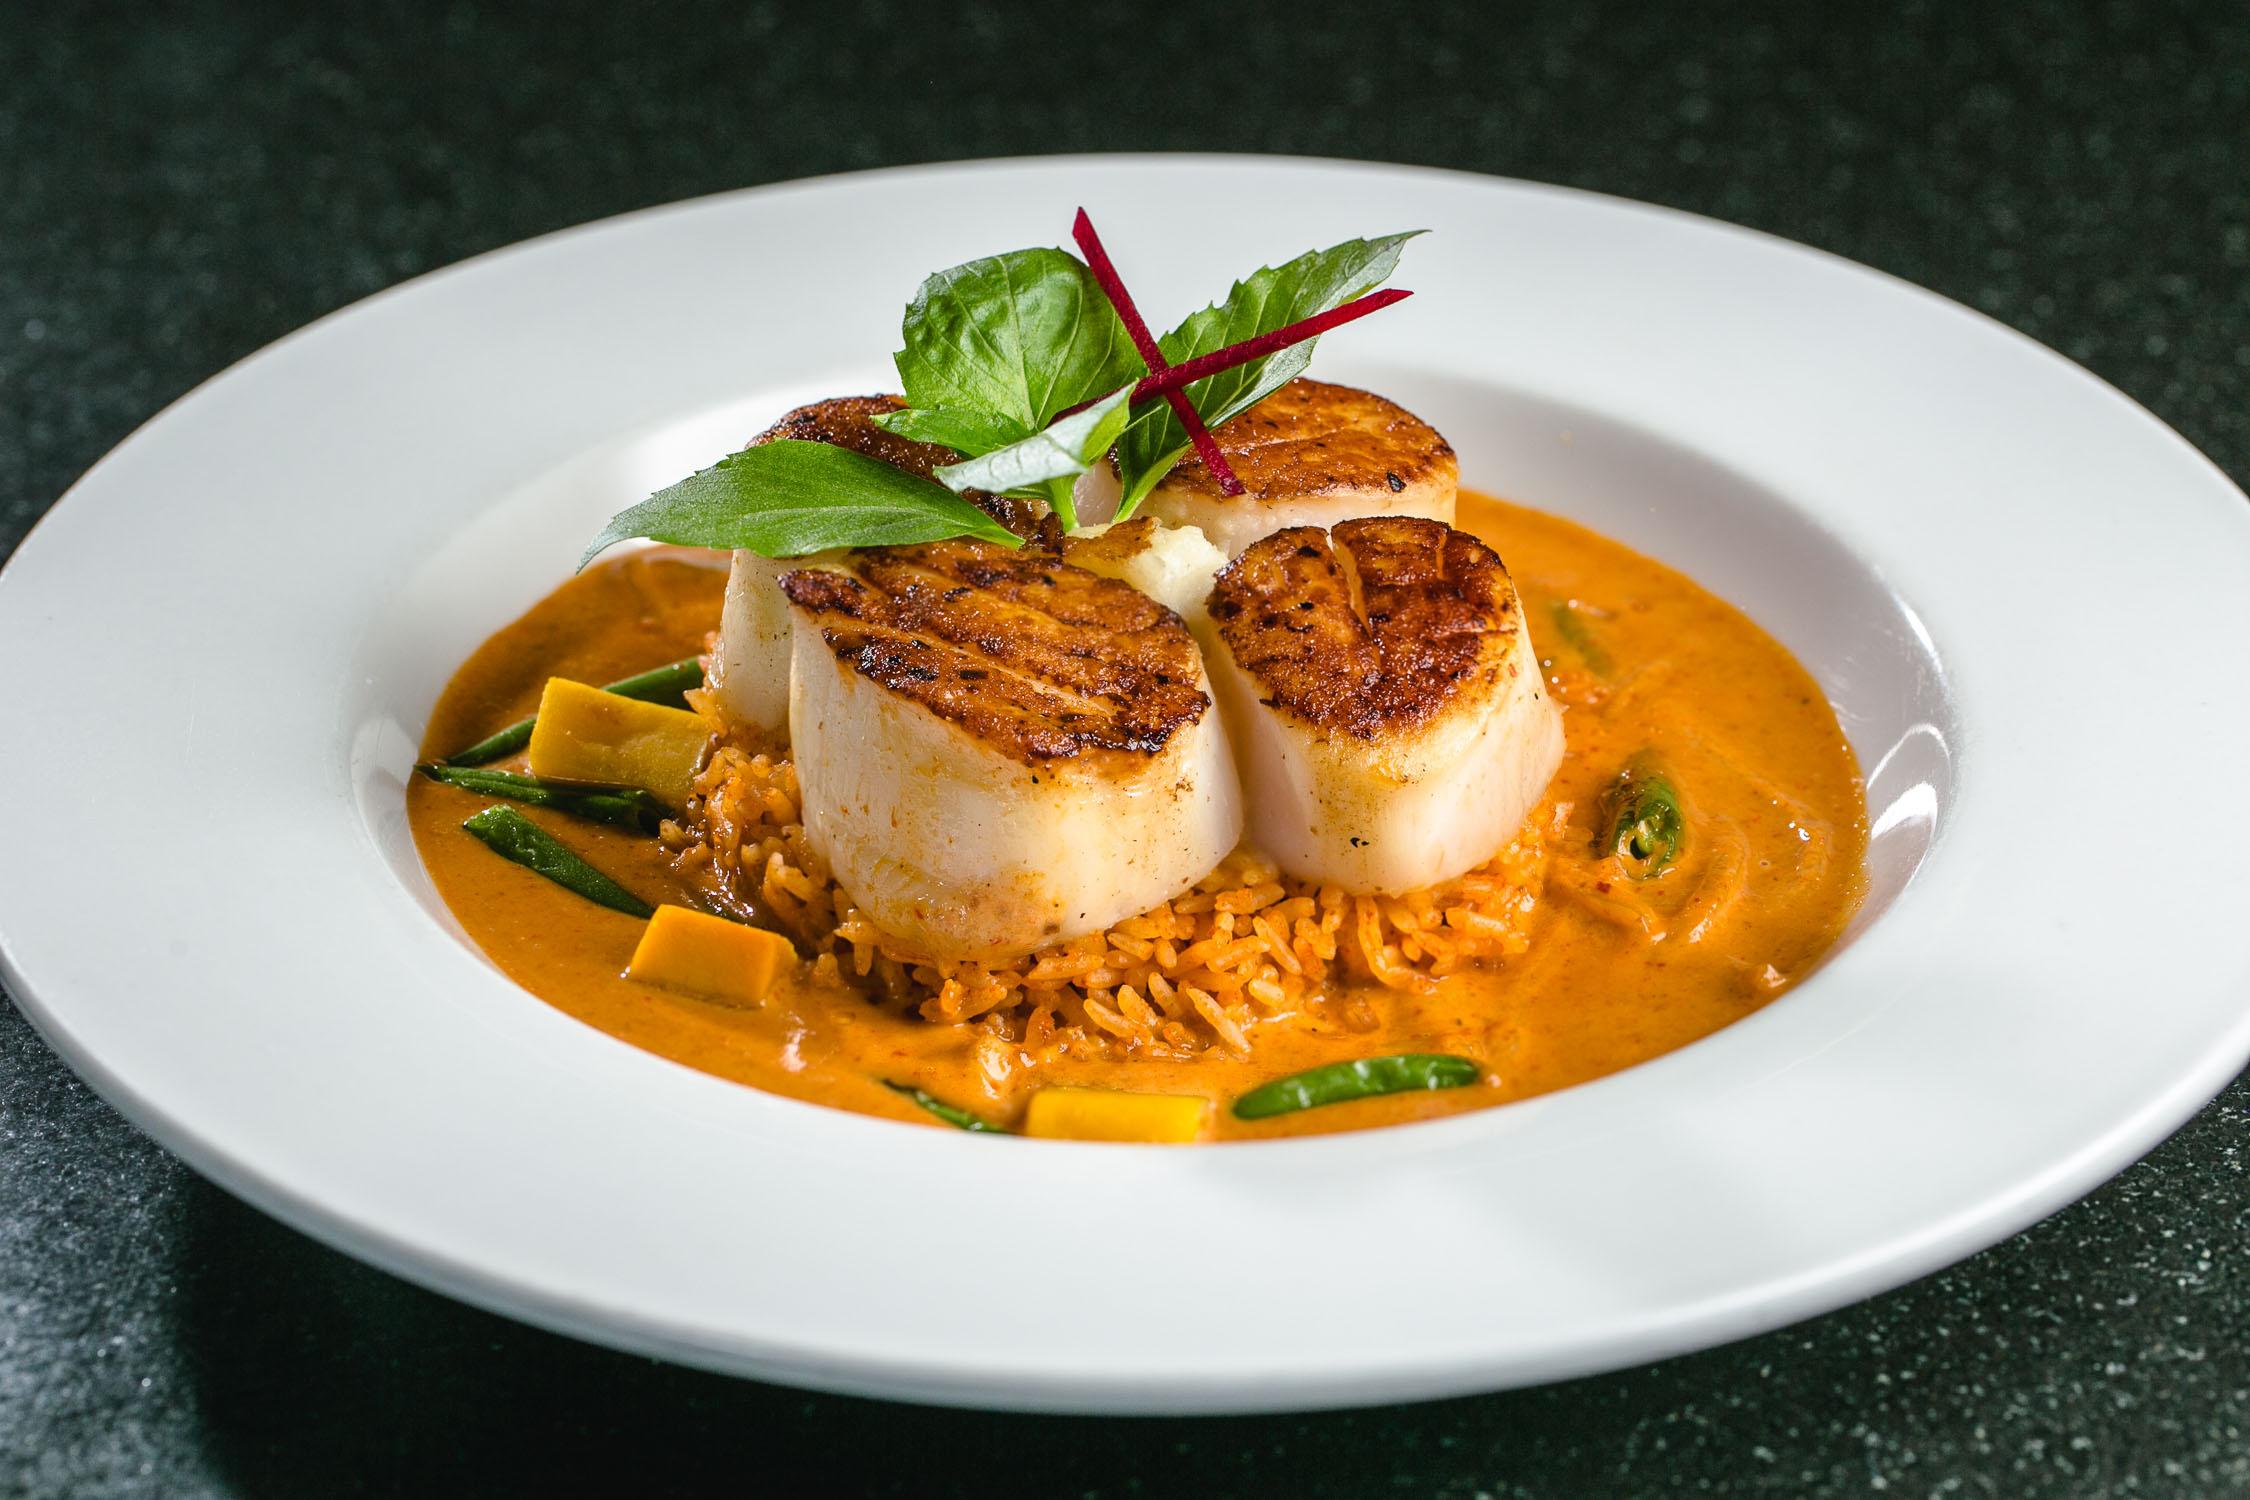 Nan-Thai-Fine-Dining-Scallops-Erik-Meadows